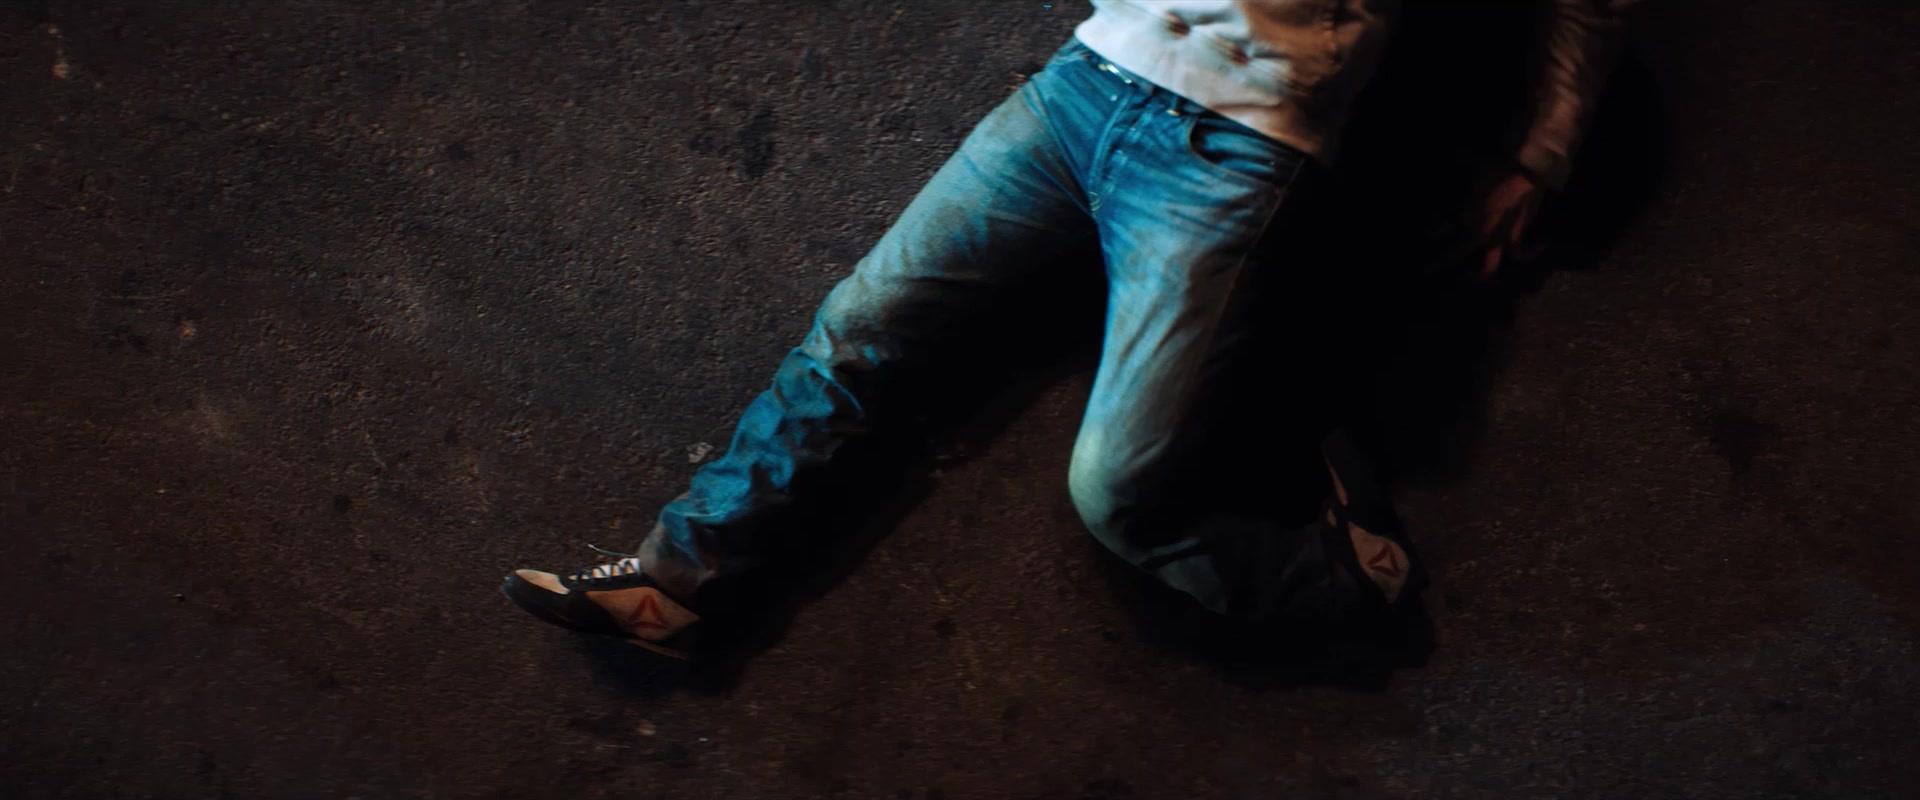 Reebok Shoes Worn by Tom Hardy in Venom